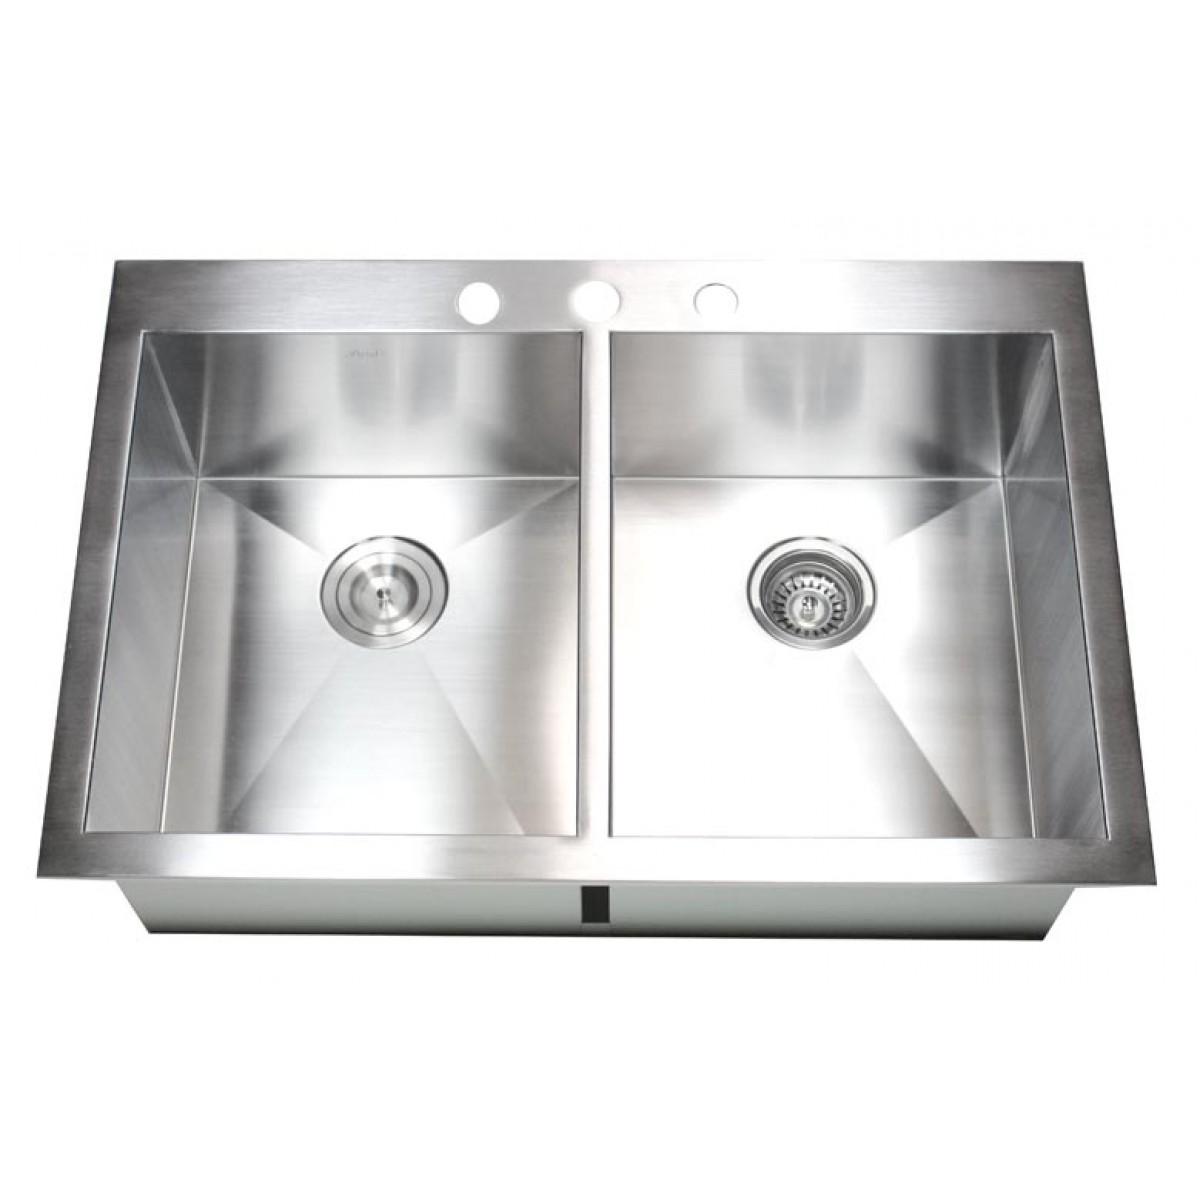 Drop In Stainless Steel Kitchen Sinks 33 inch top-mount / drop-in stainless steel double bowl kitchen sink